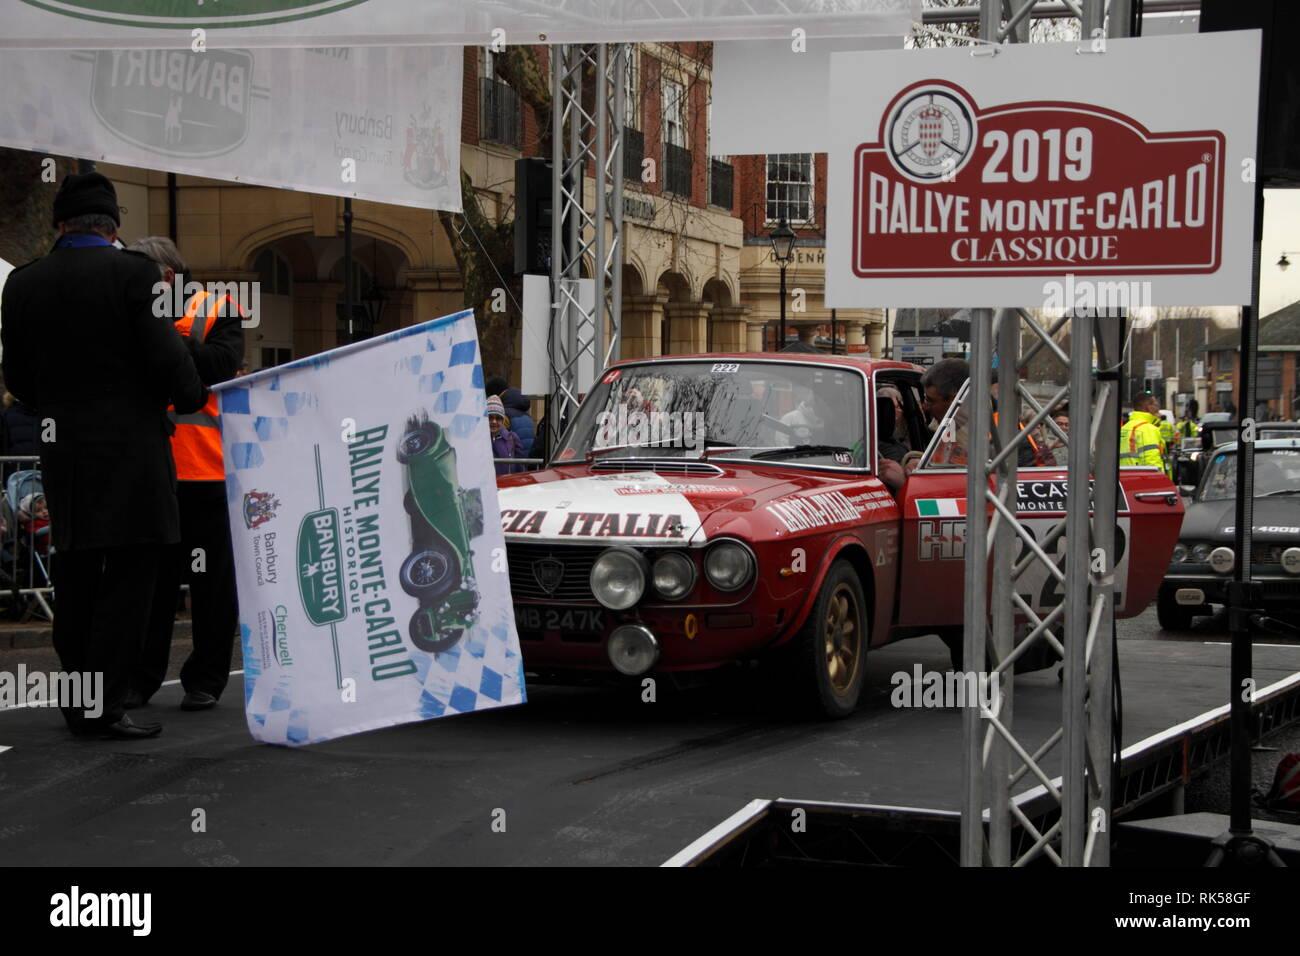 Monte Carlo Rally Banbury 2019 Stock Photo